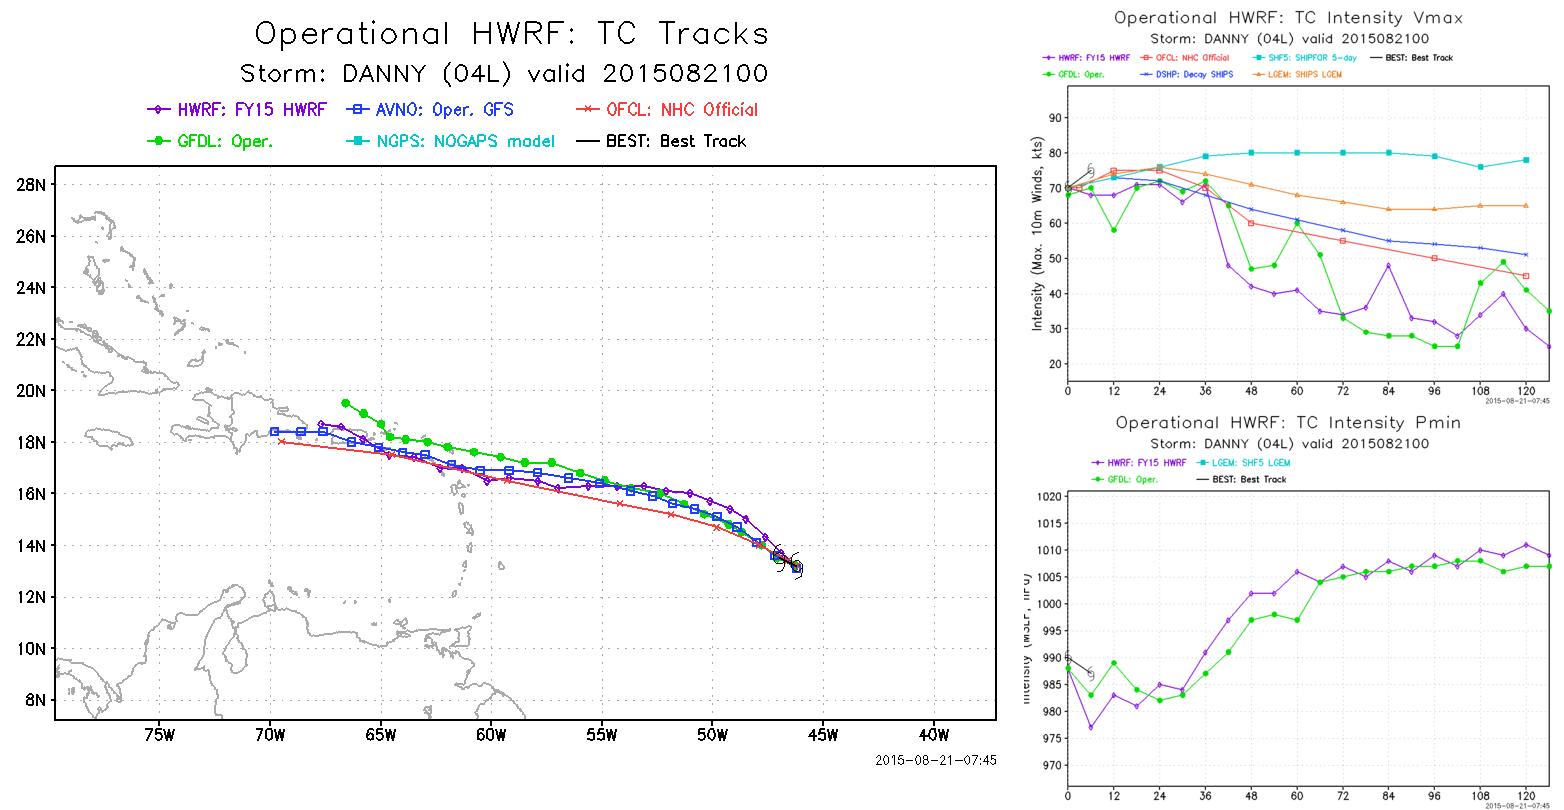 Ncep Operational Hwrf Forecasting System Weather Models Best Track Forecast